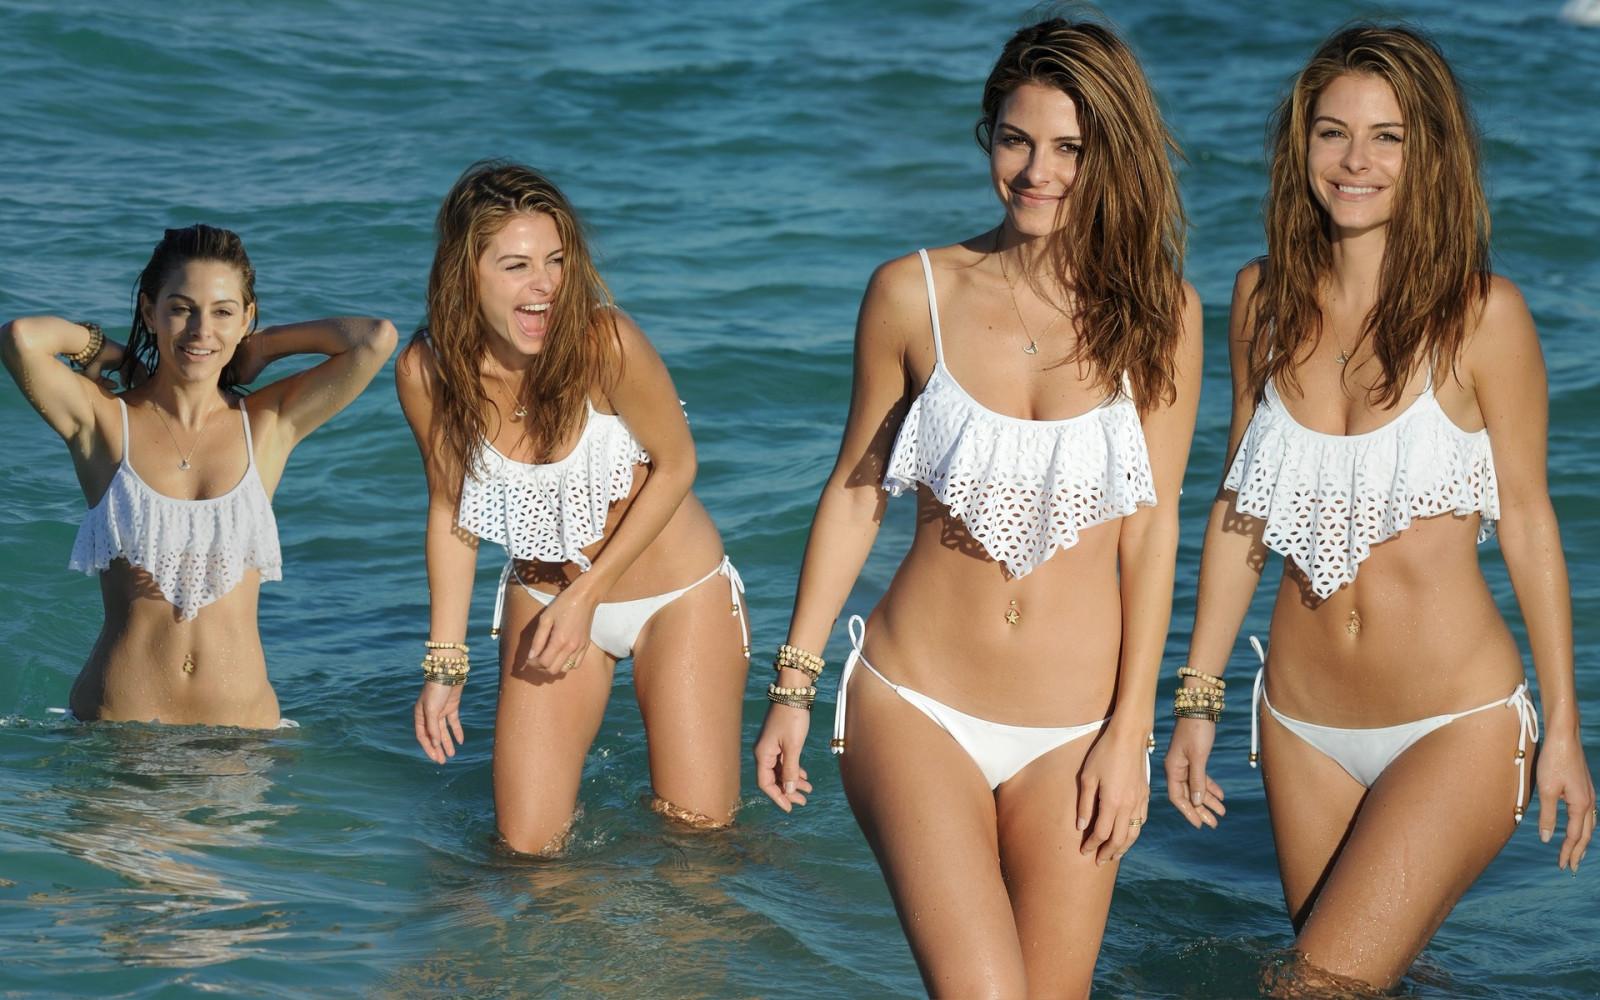 Bikini pictures collage, kinky overalls